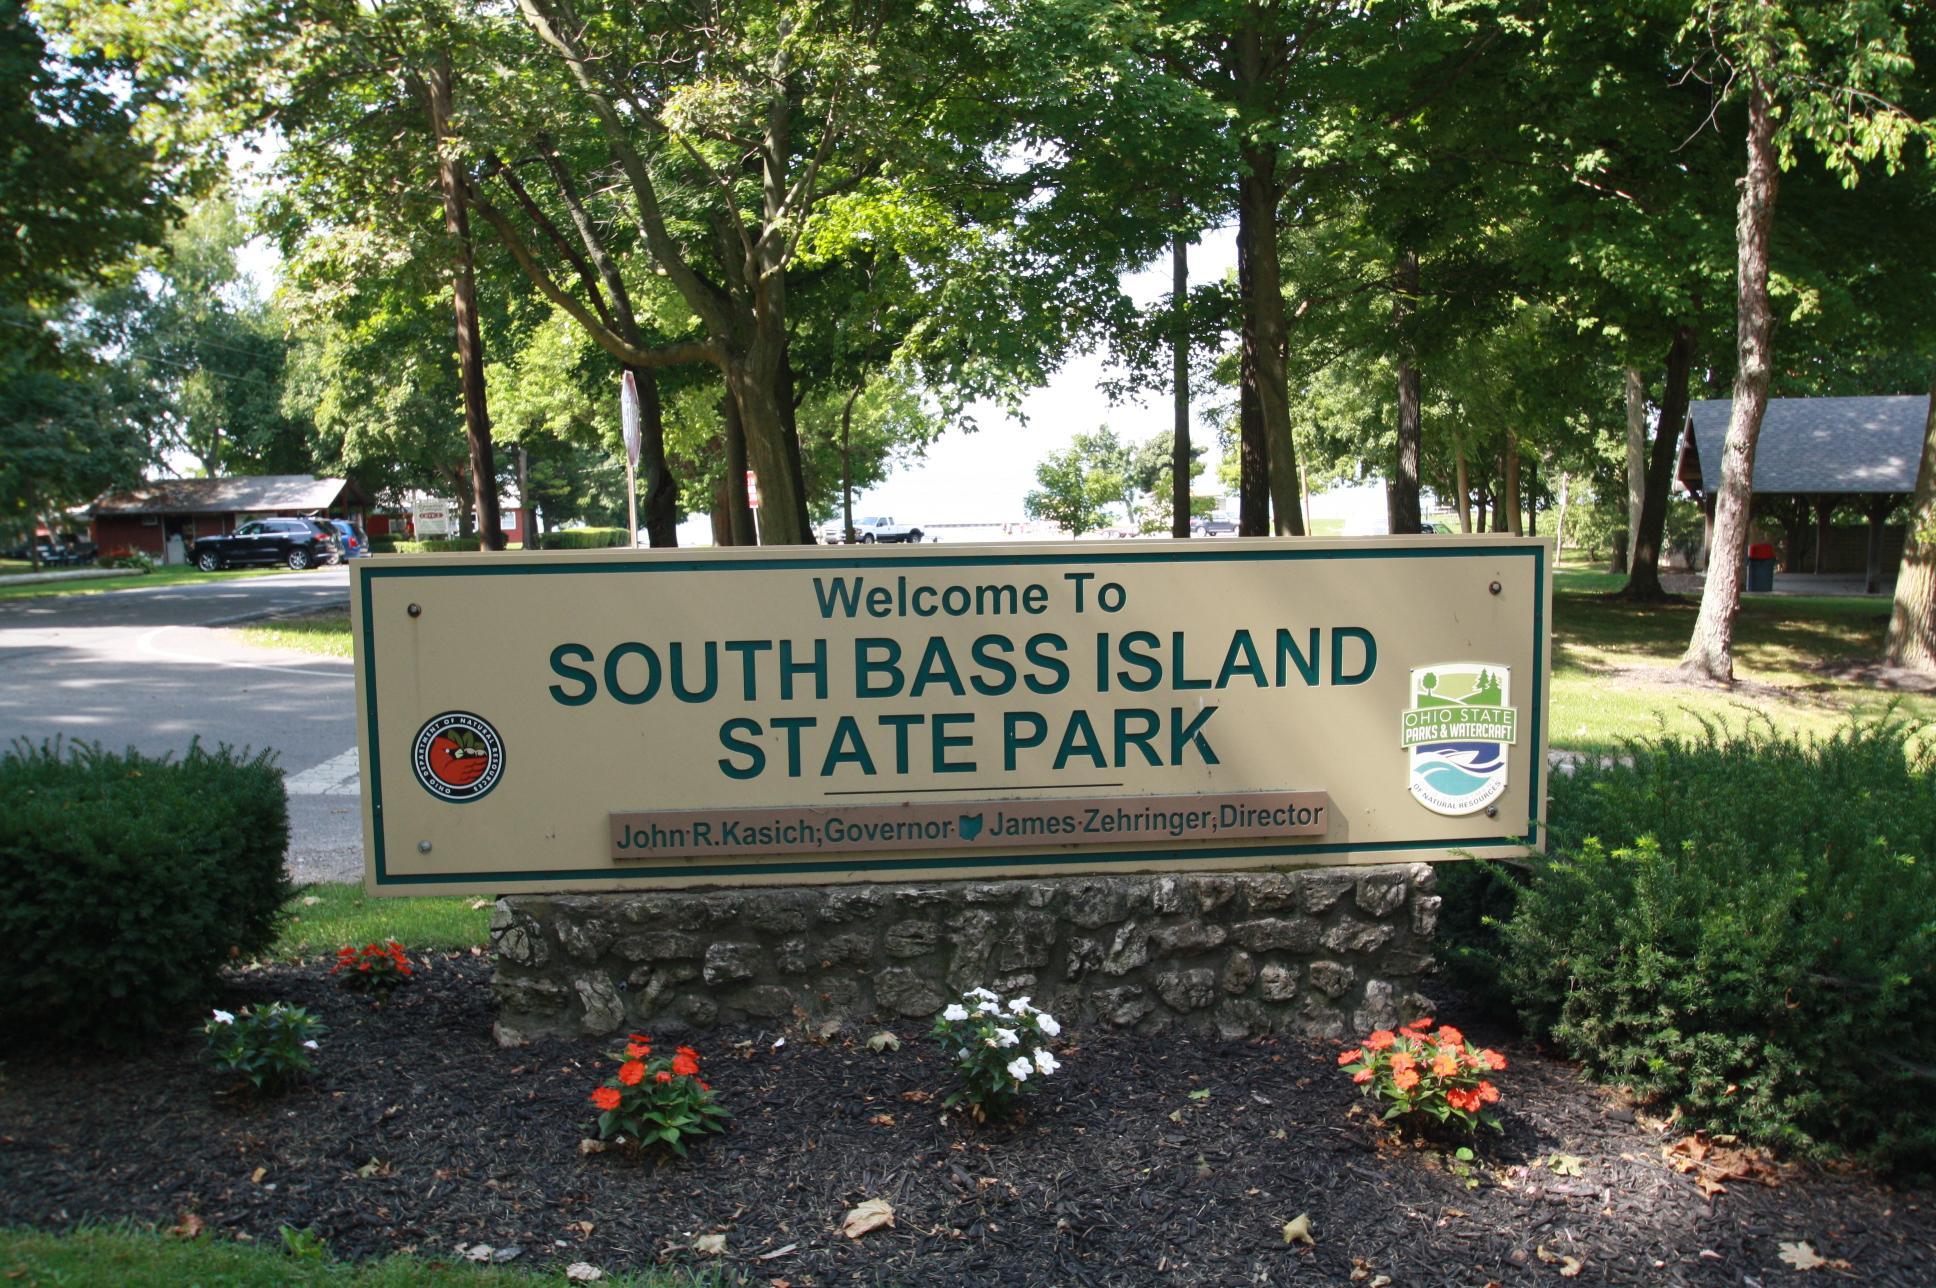 South Bass Island State Park